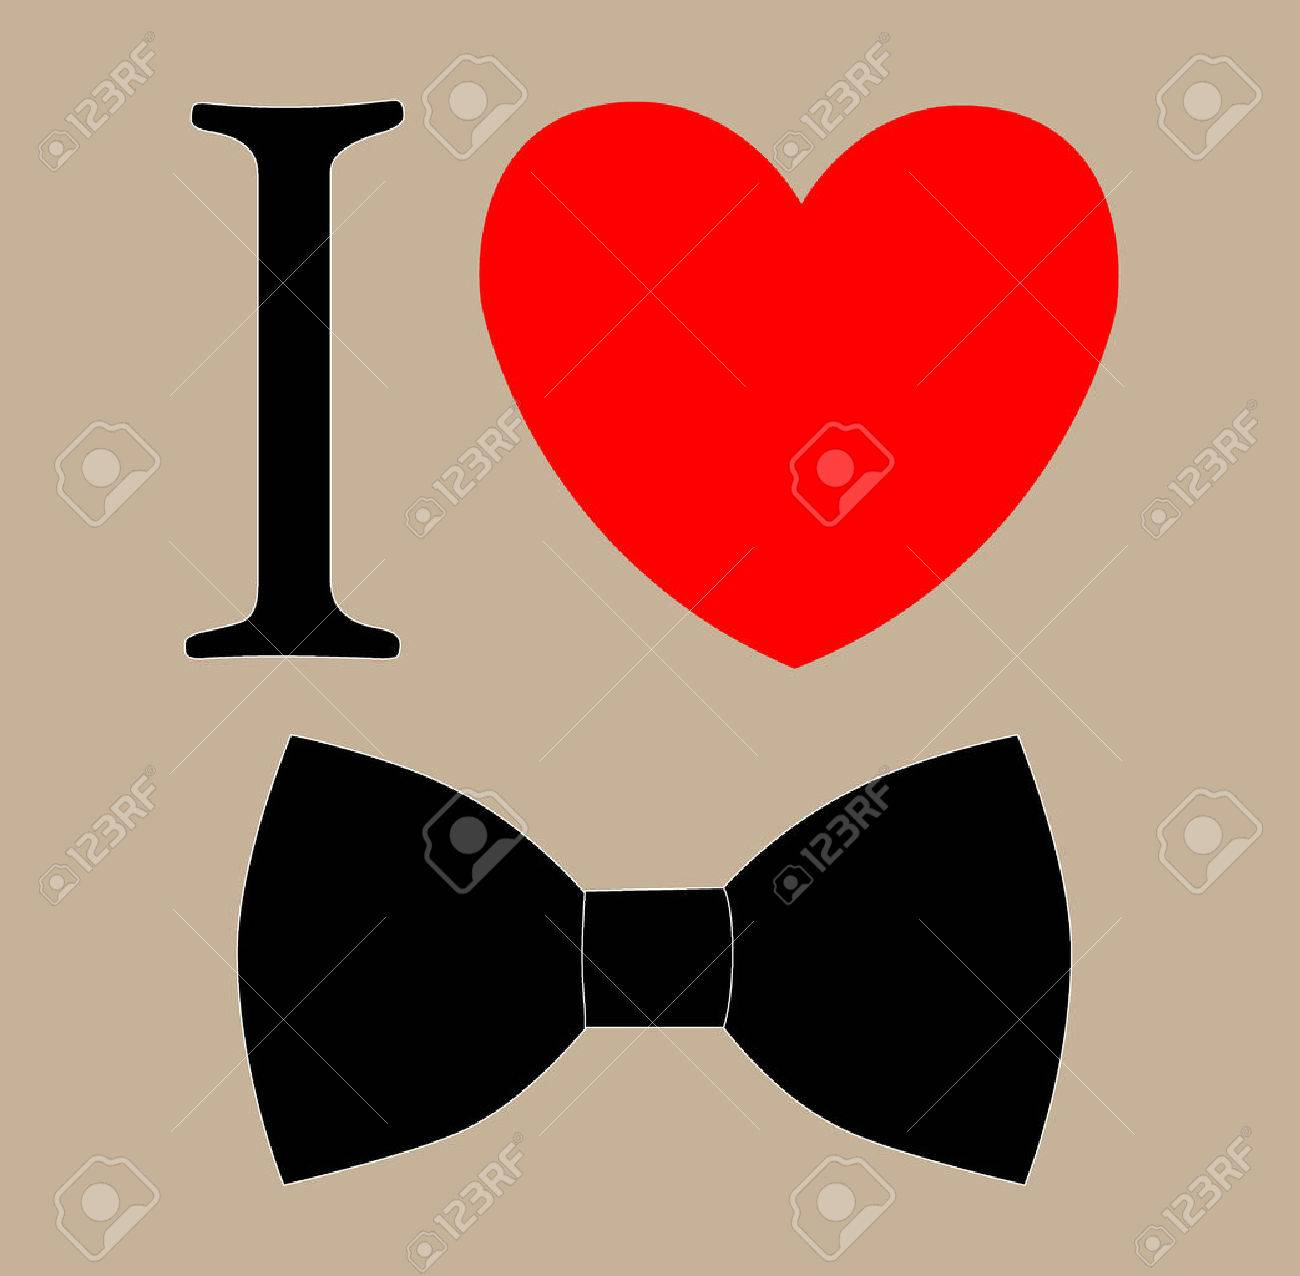 print I love bow tie. - 31104756